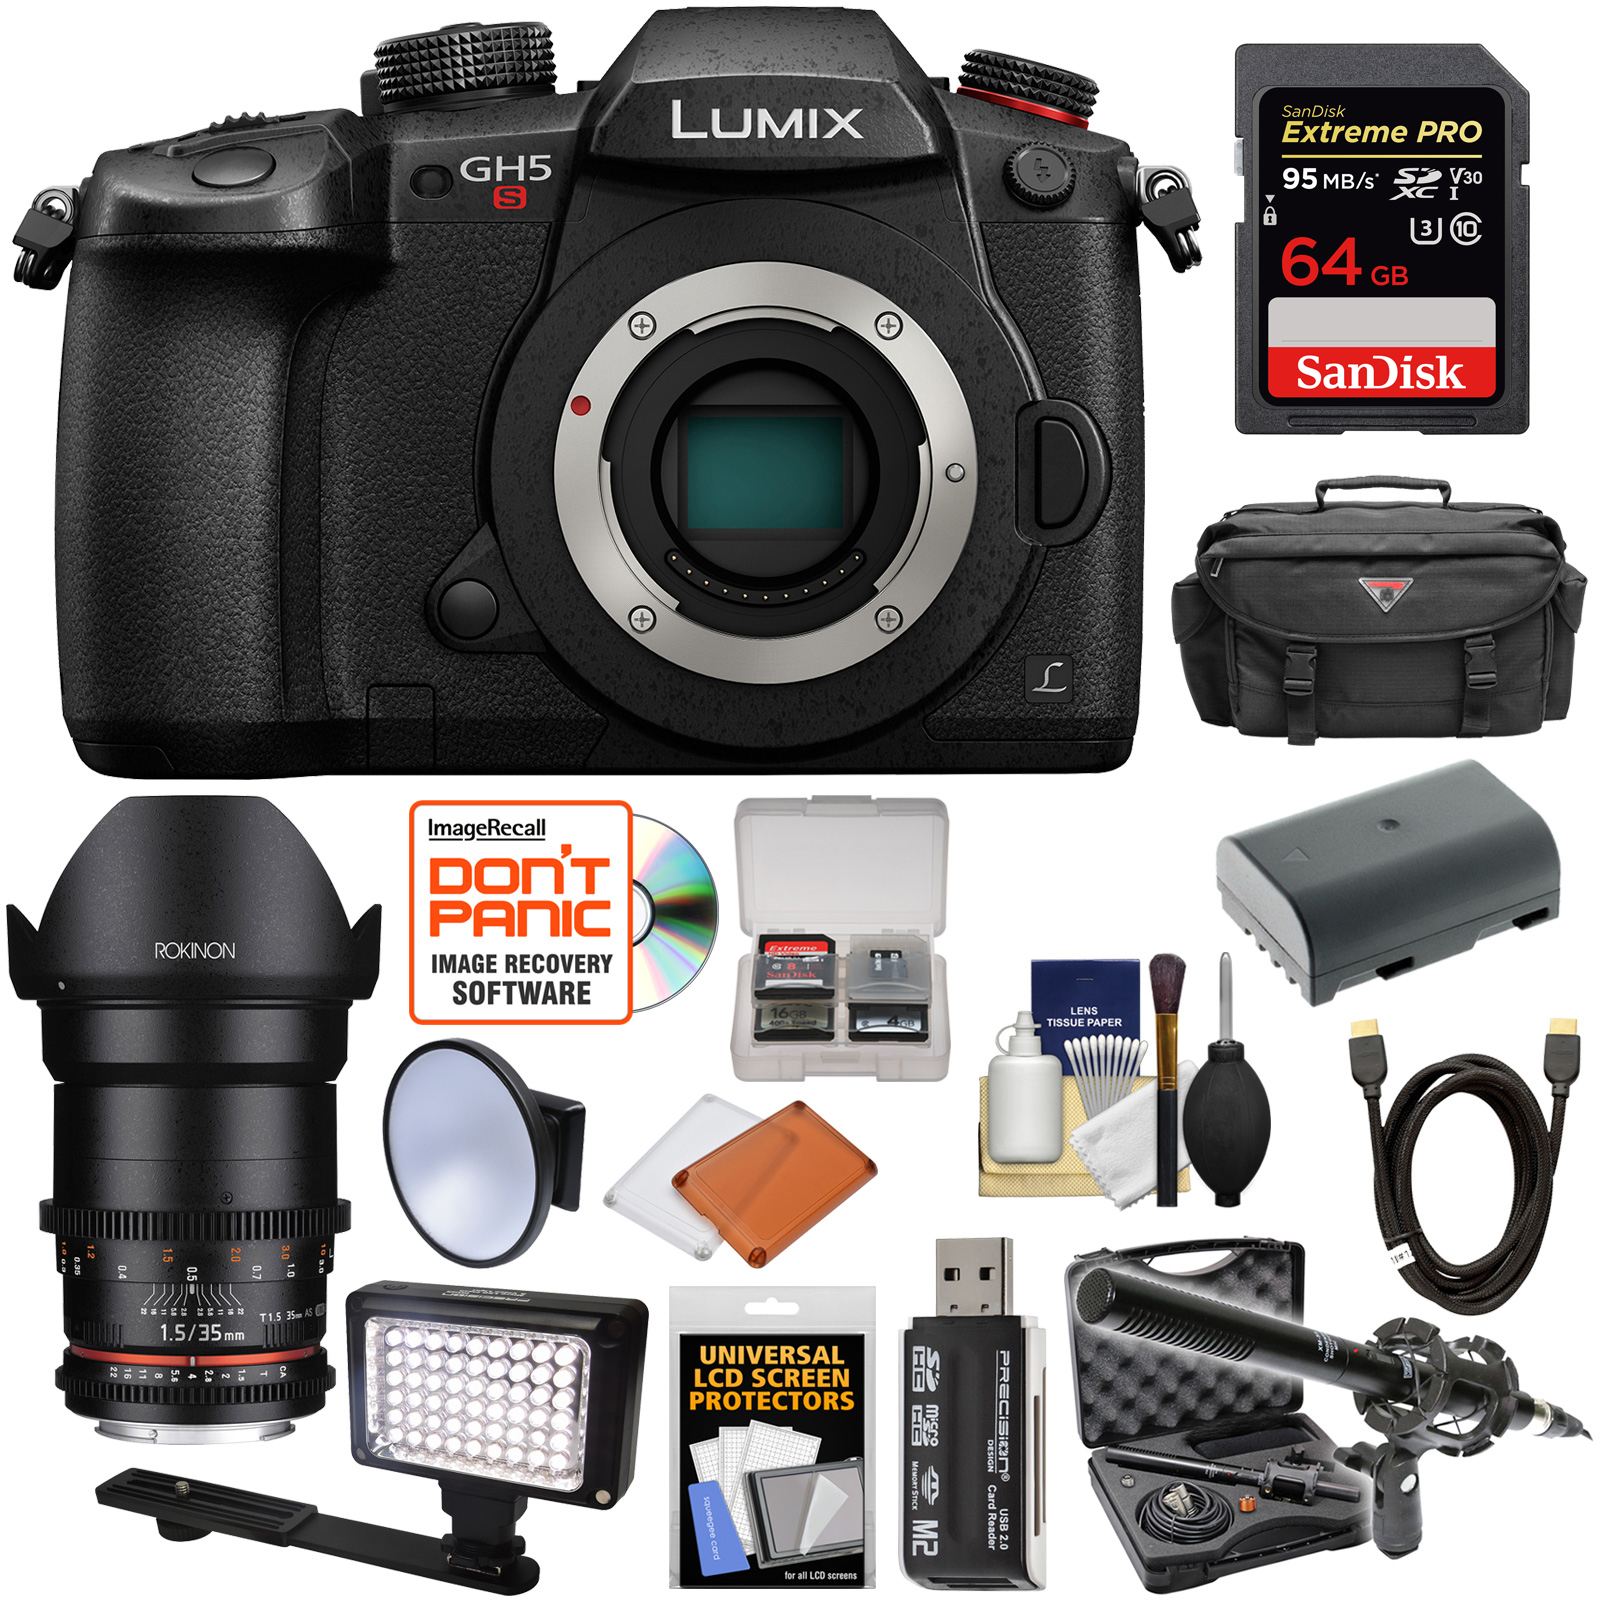 Panasonic Lumix DC-GH5S Wi-Fi C4K Digital Camera Body with 35mm T 1.5 CINE Lens + 64GB Card + Battery + Case +... by Panasonic